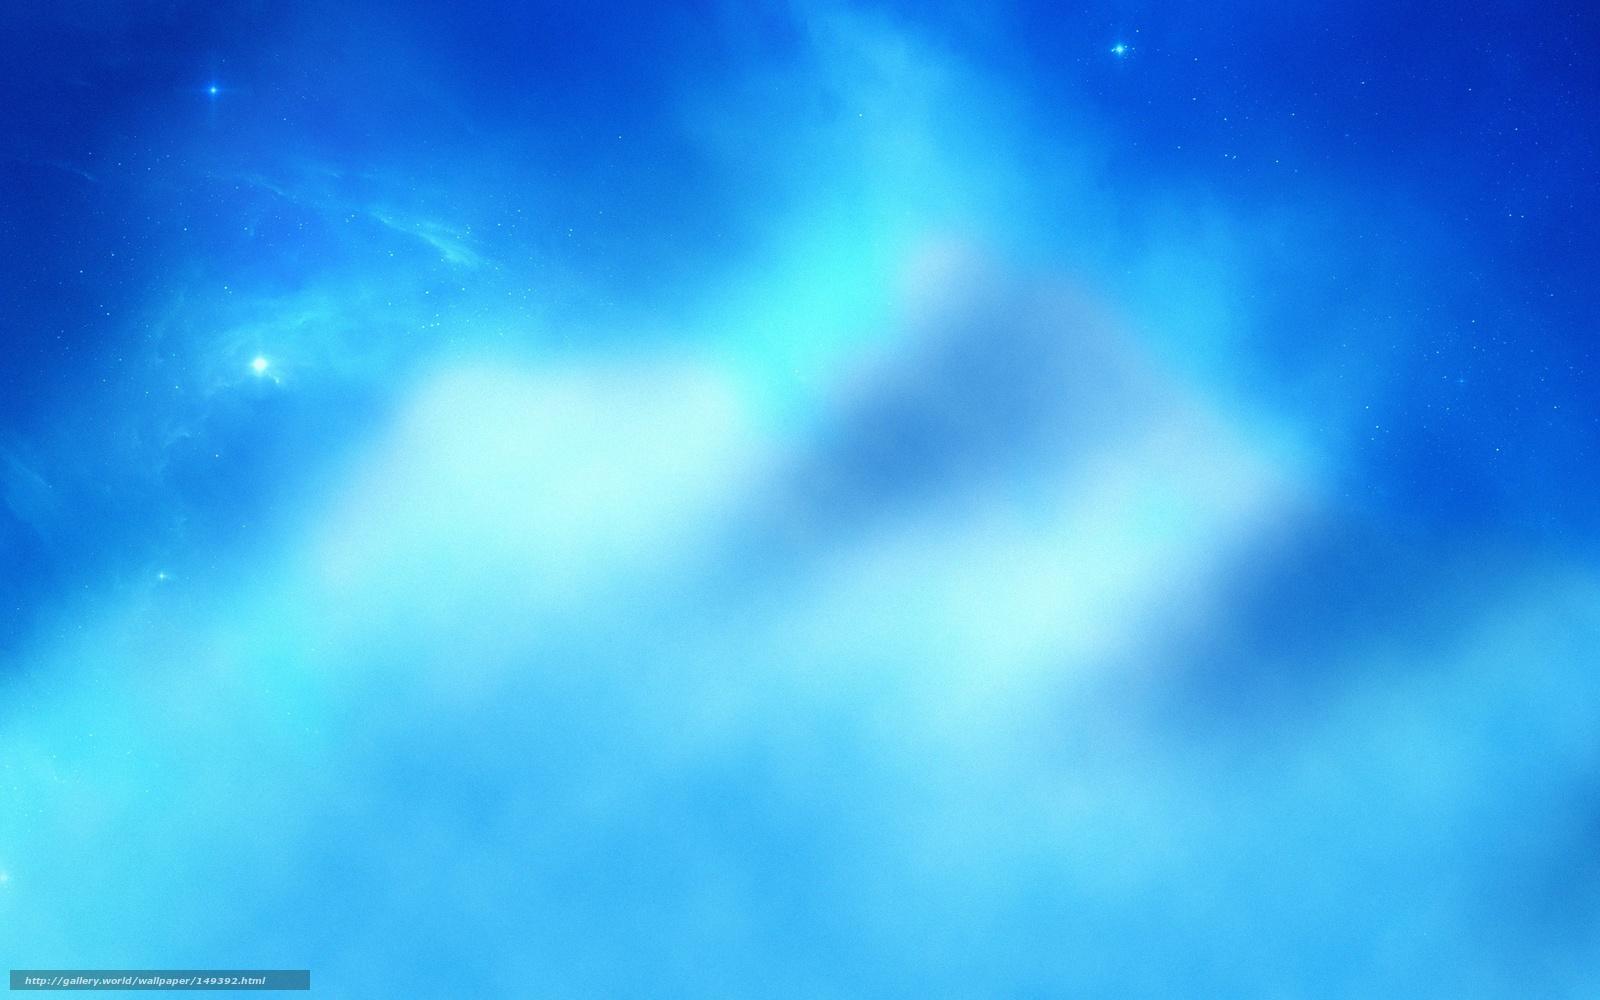 tlcharger fond d 39 ecran ciel bleu bleu fonds d 39 ecran gratuits pour votre rsolution du bureau. Black Bedroom Furniture Sets. Home Design Ideas